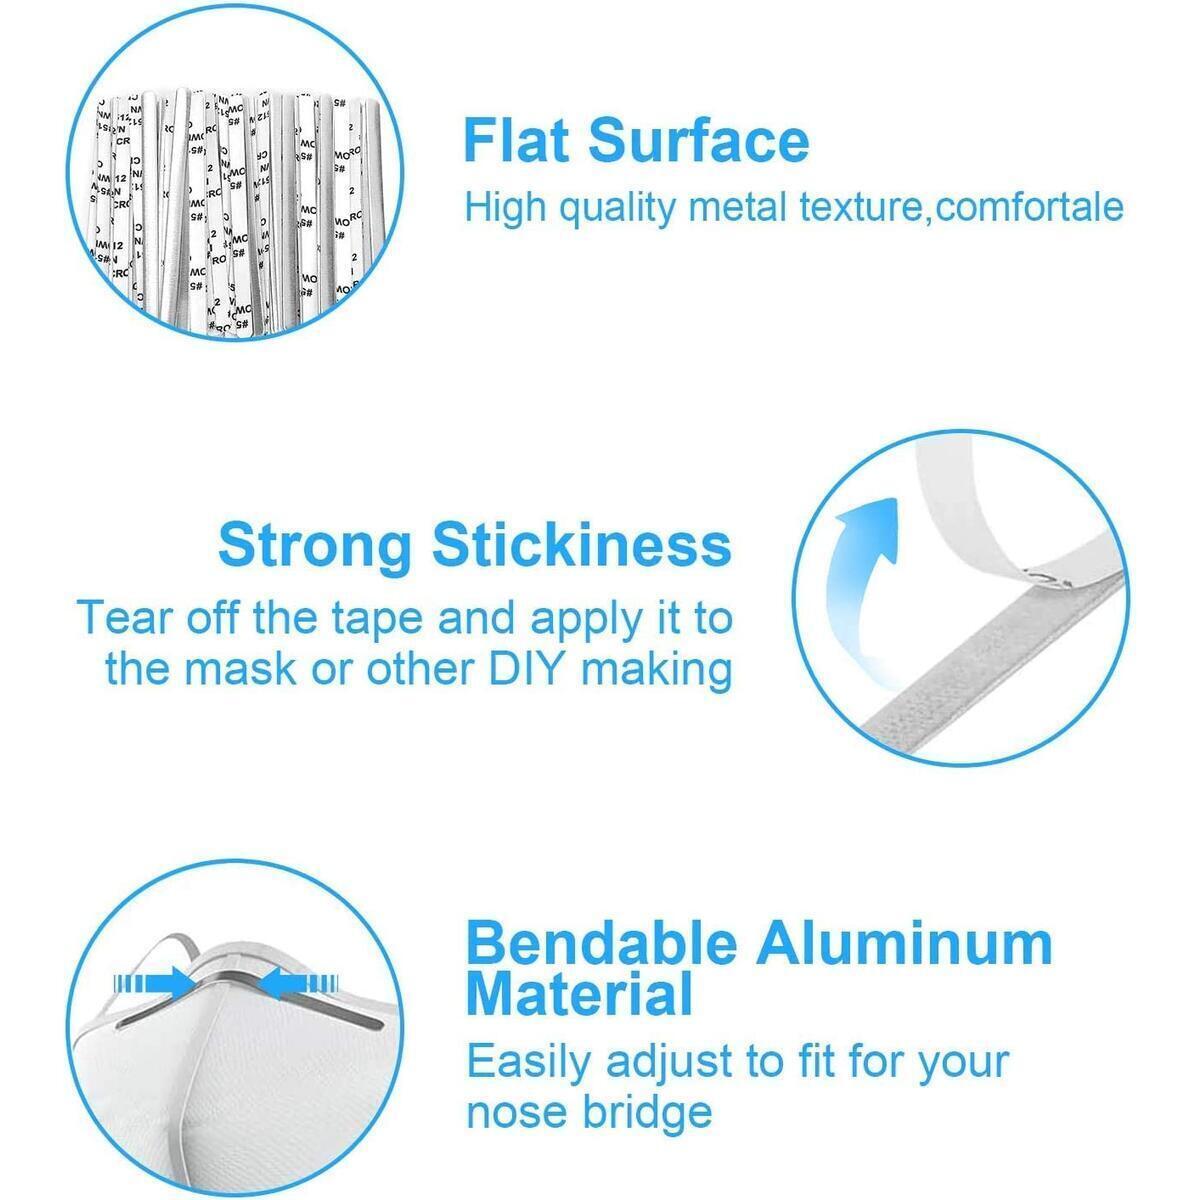 Elastic Band 100 Yard, 1/4 Inch Wide Elastic String and Nose Bridge for Mask, 100PCS Metal Aluminum Nose Bridge Strip for DIY Mask Handmade Crafting